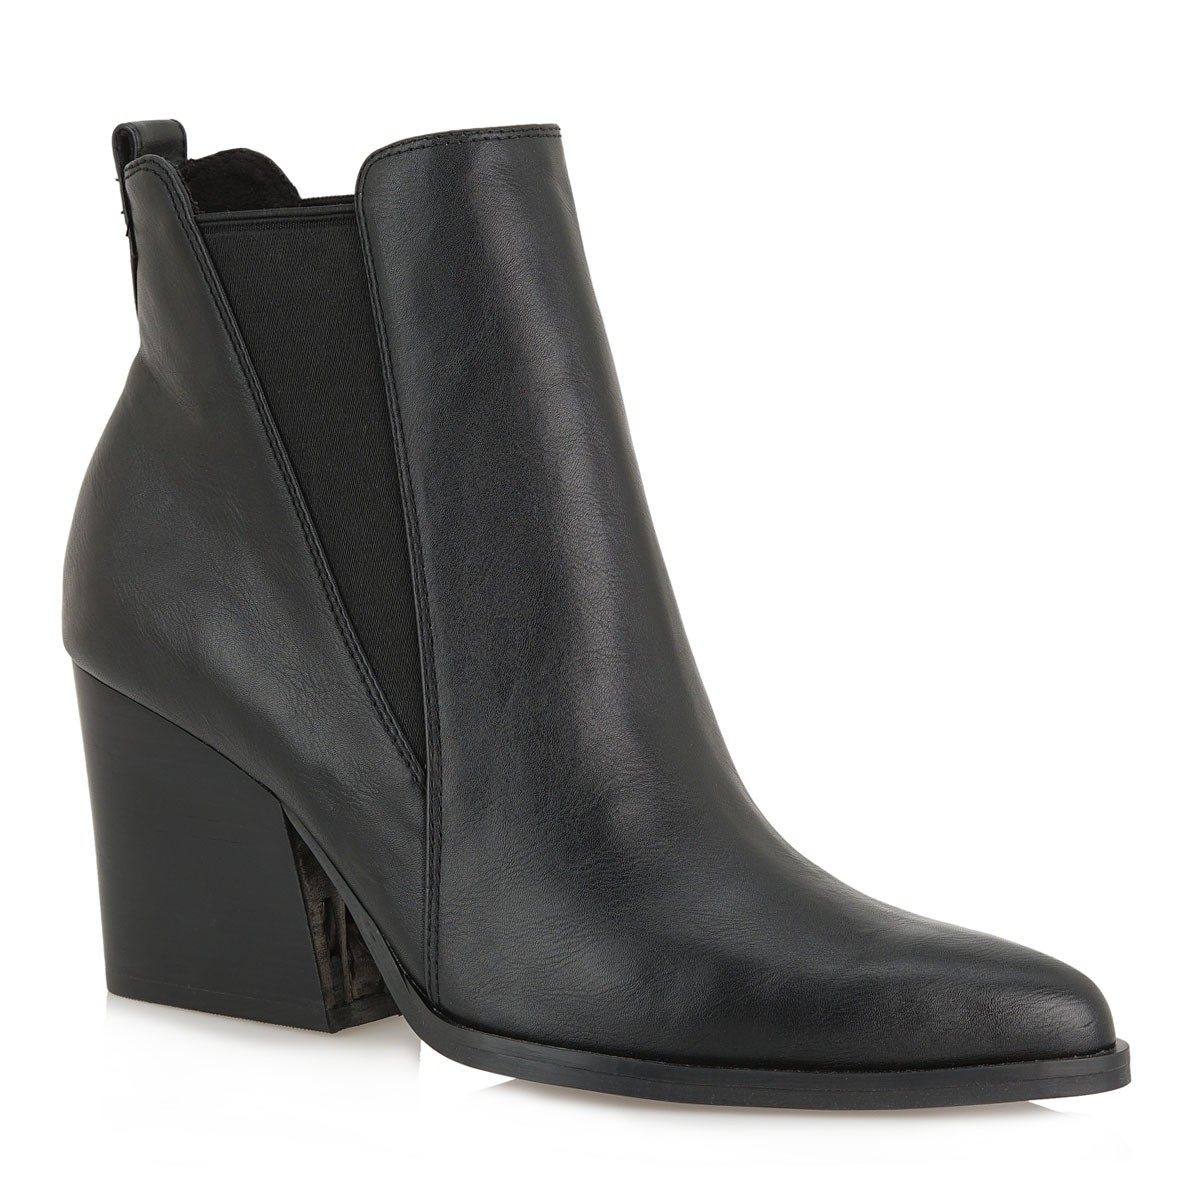 Exe Shoes Γυναικεία Μποτάκια RAMONA-501 Μαύρo J37005104001